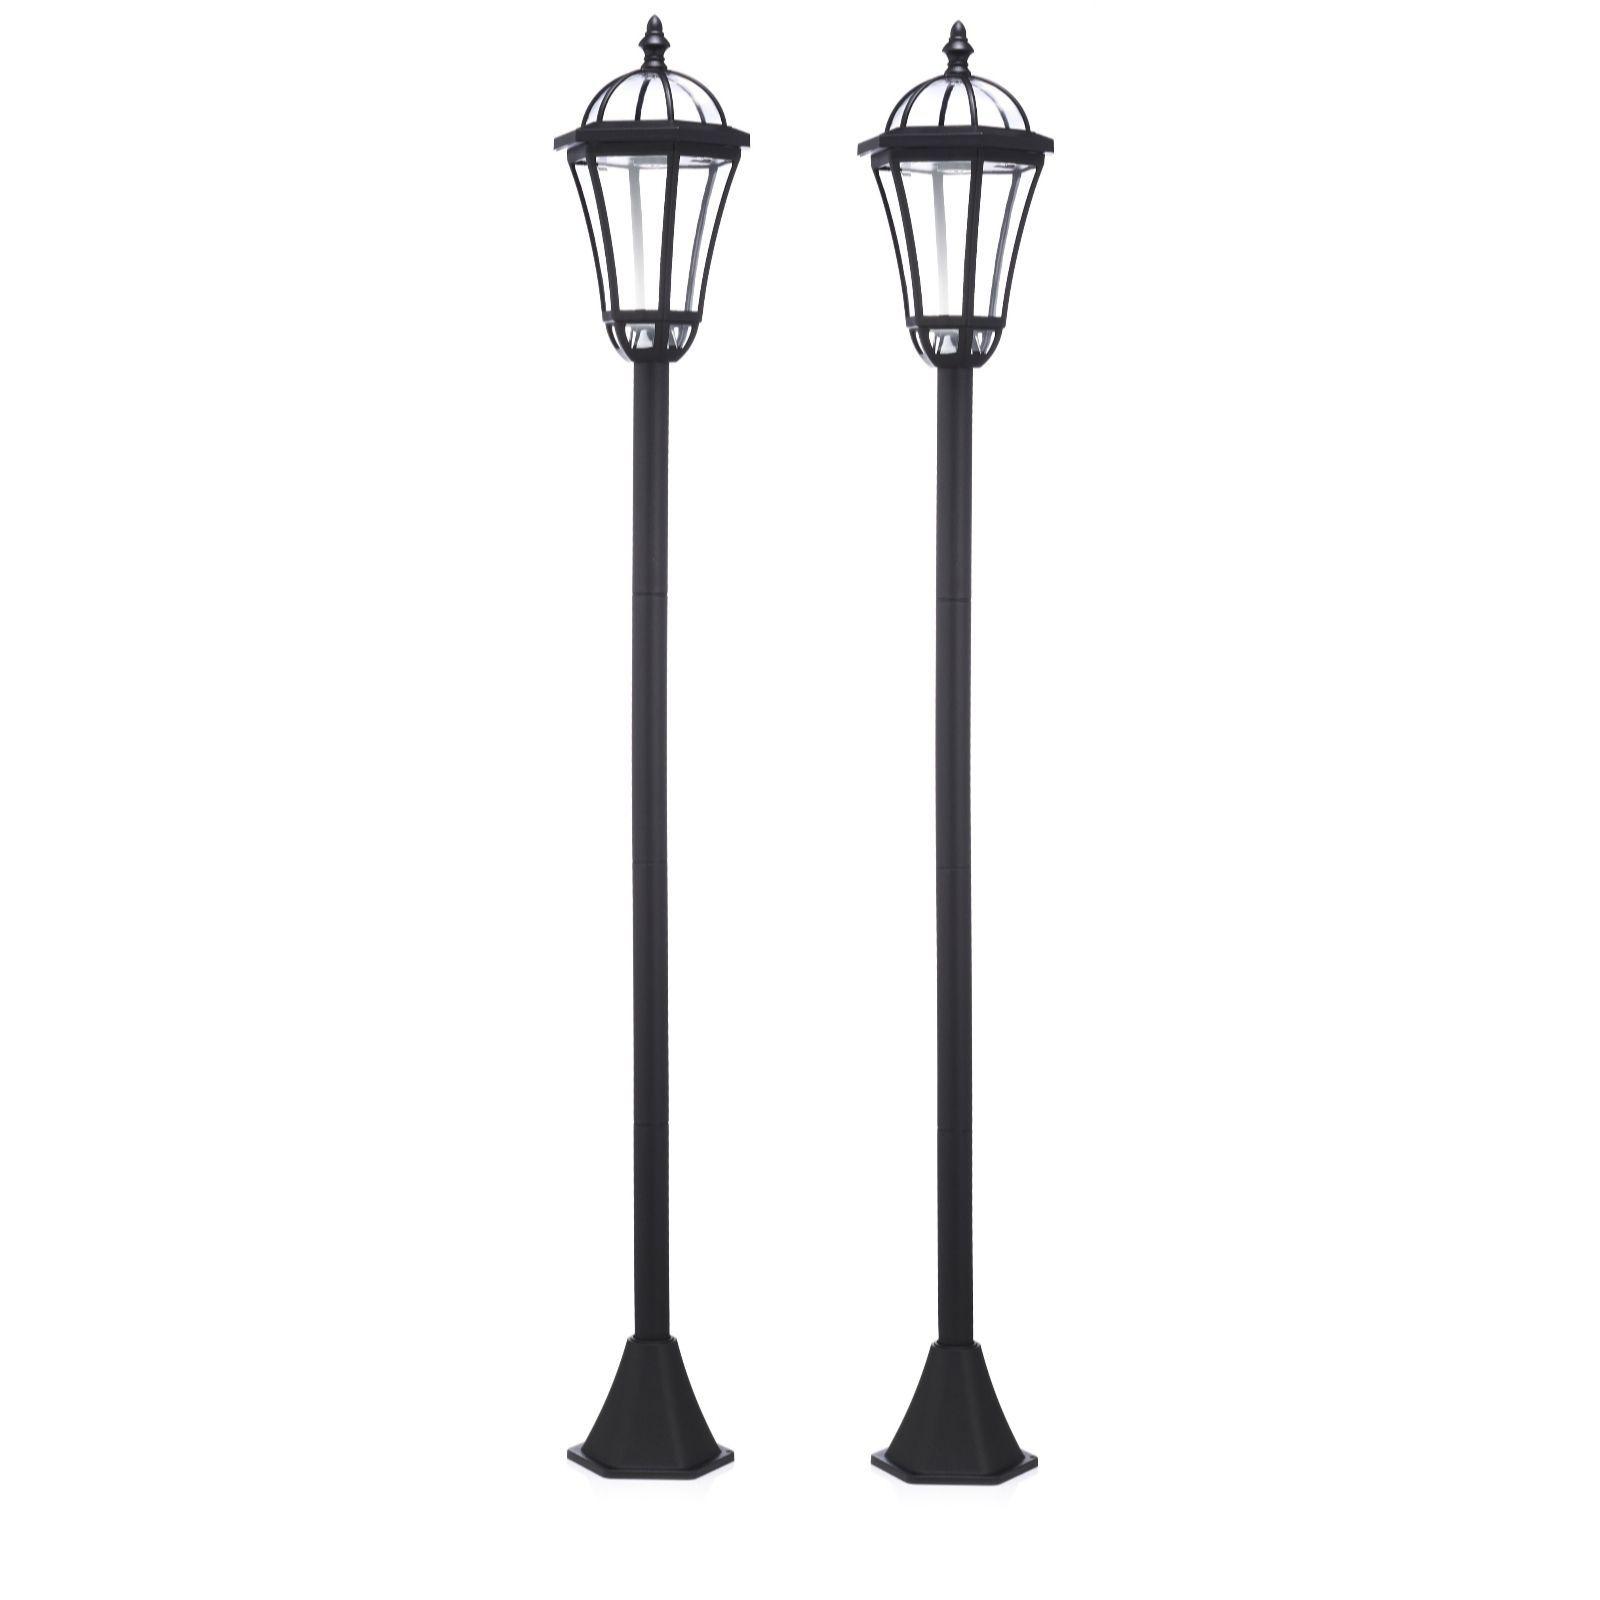 Luxform Set Of 2 Kensington Solar Powered 1 3m Lamp Posts Qvc Uk In 2020 Lamp Post Solar Powered Lamp Lighting Your Garden